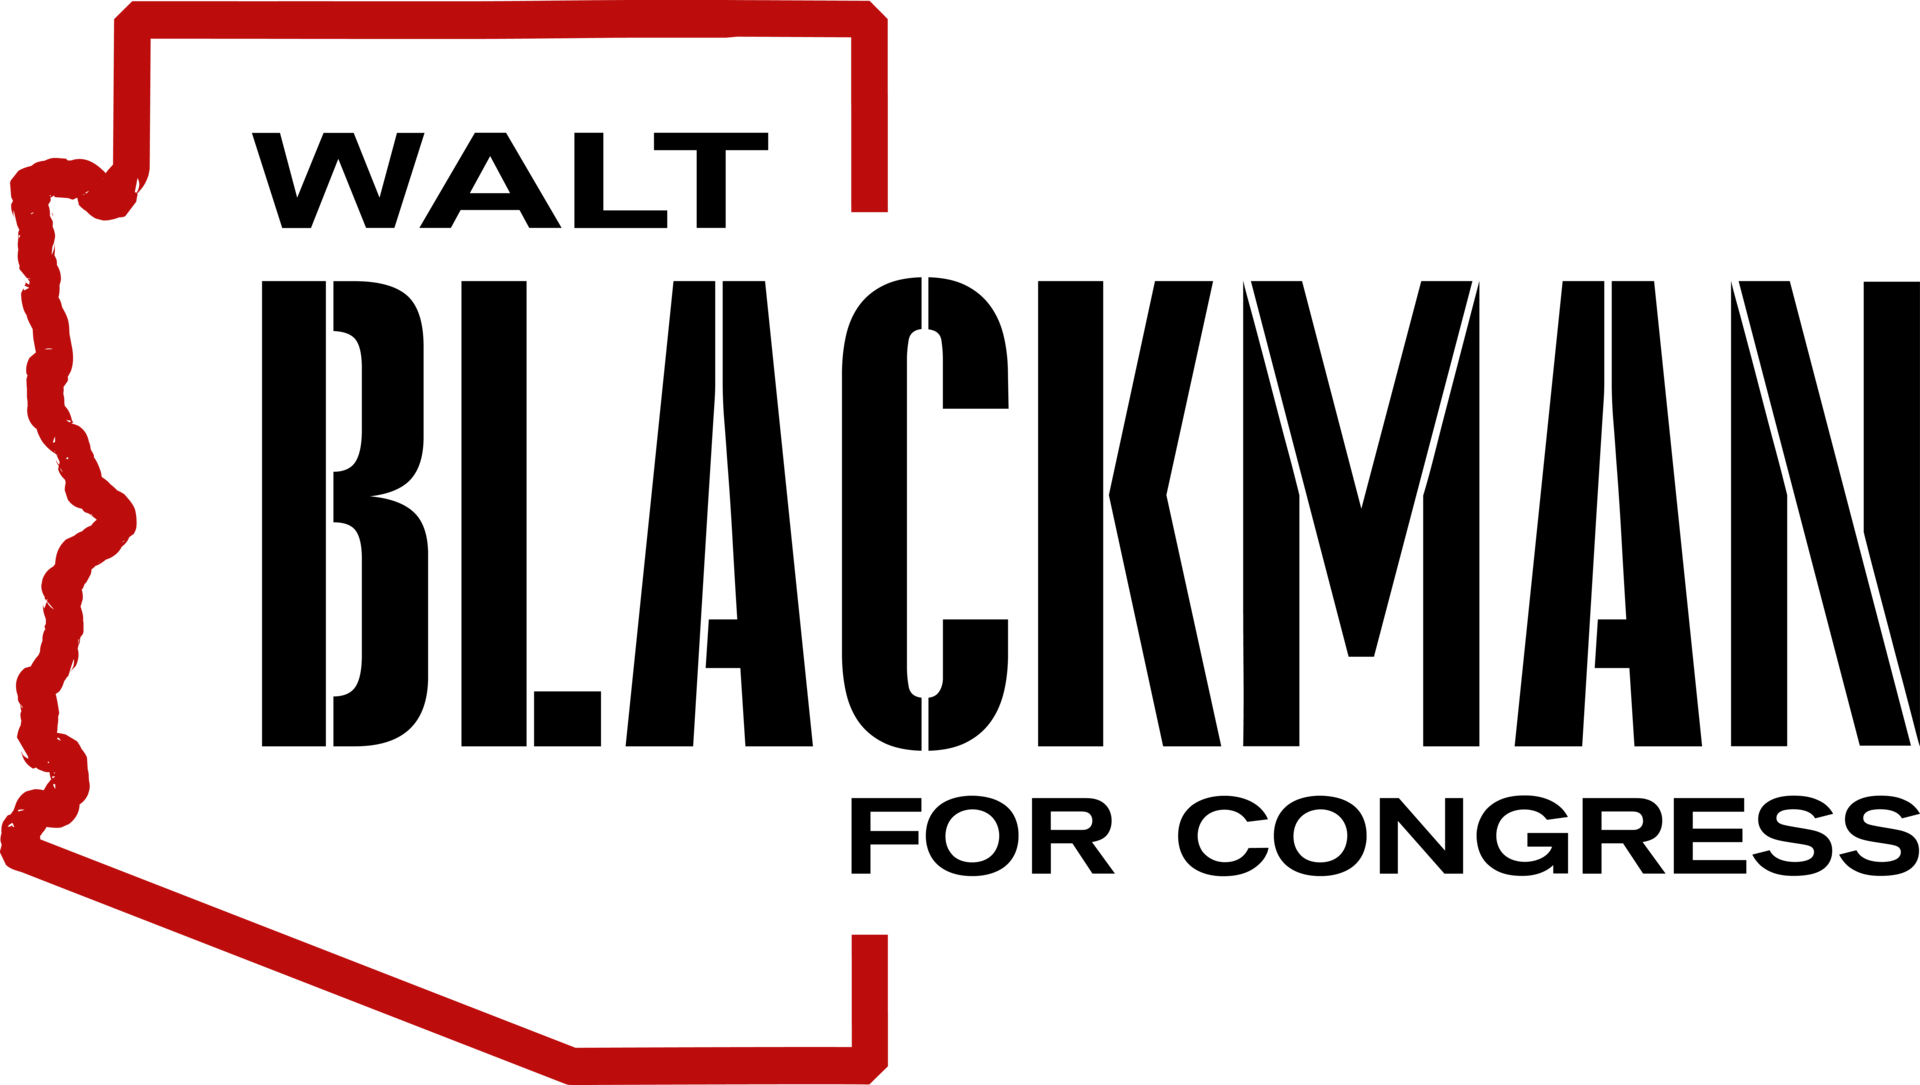 Blackman logo